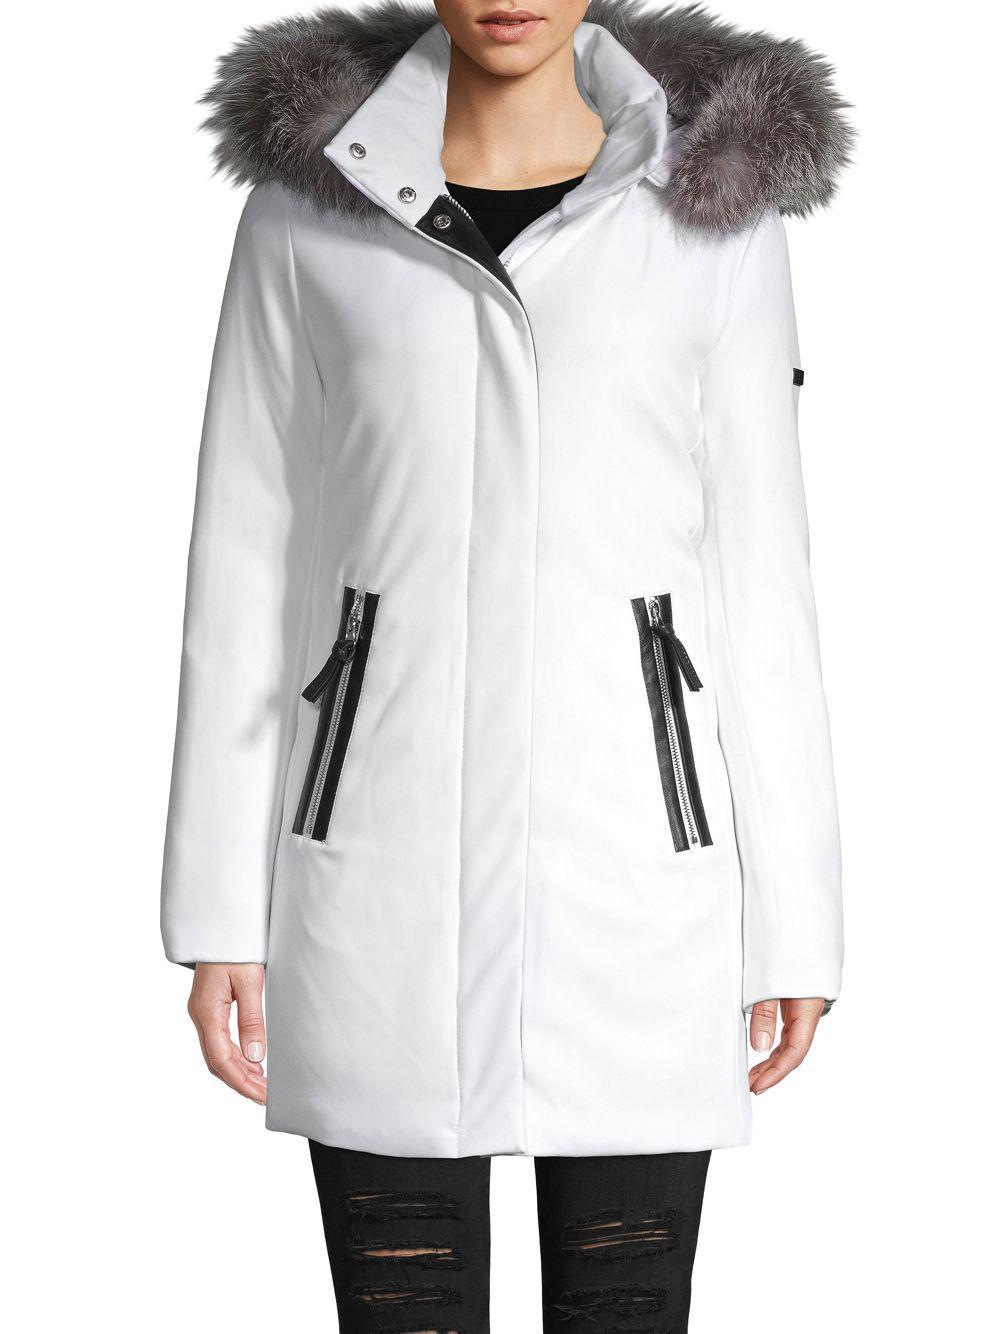 2fa41d986eac Lyst - 10 Crosby Derek Lam Fox Fur-trimmed Down Parka Coat in White